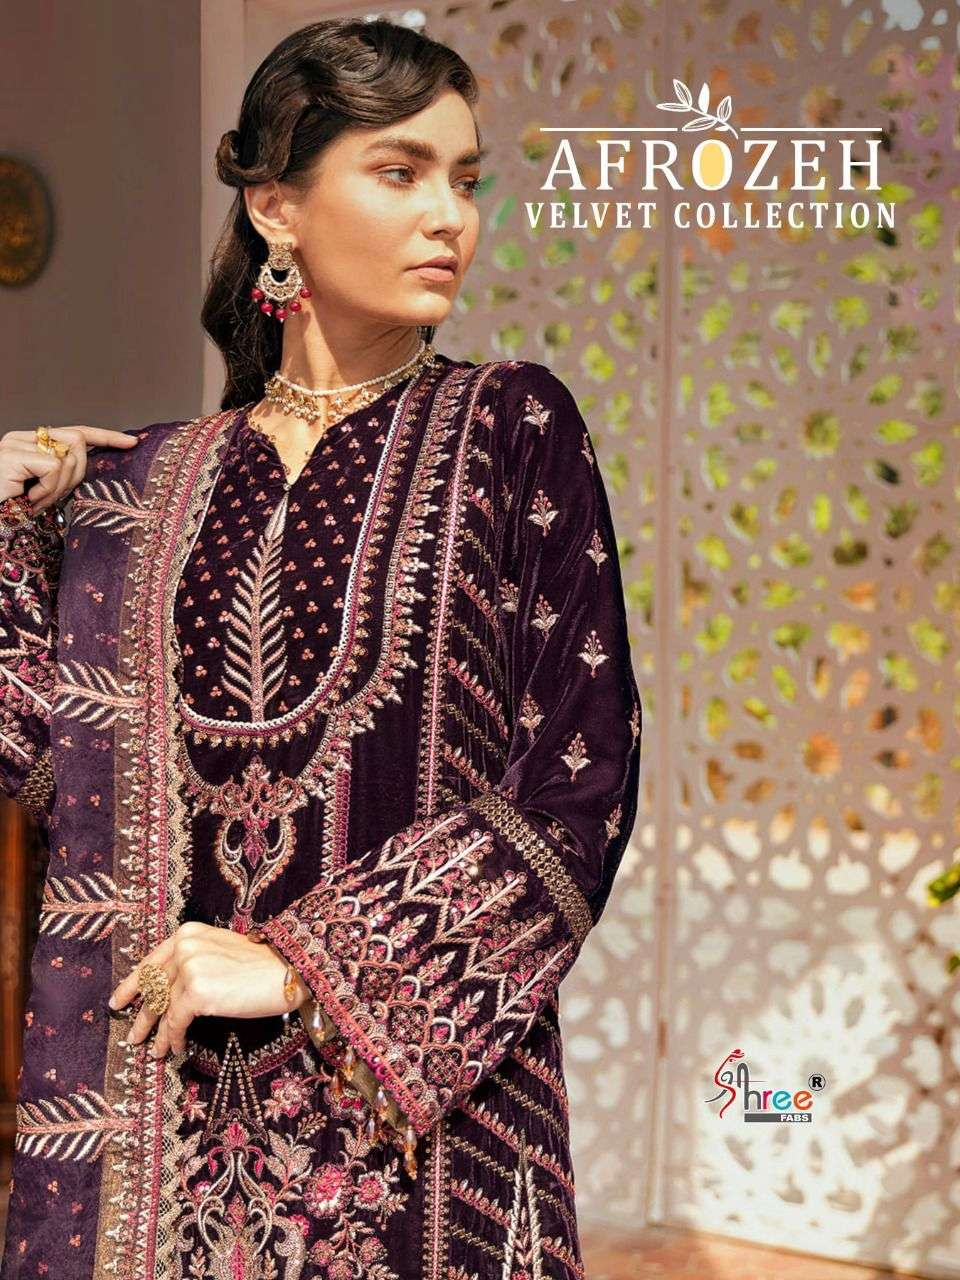 shree fabs afrozeh velvet winter pakistani designer suits